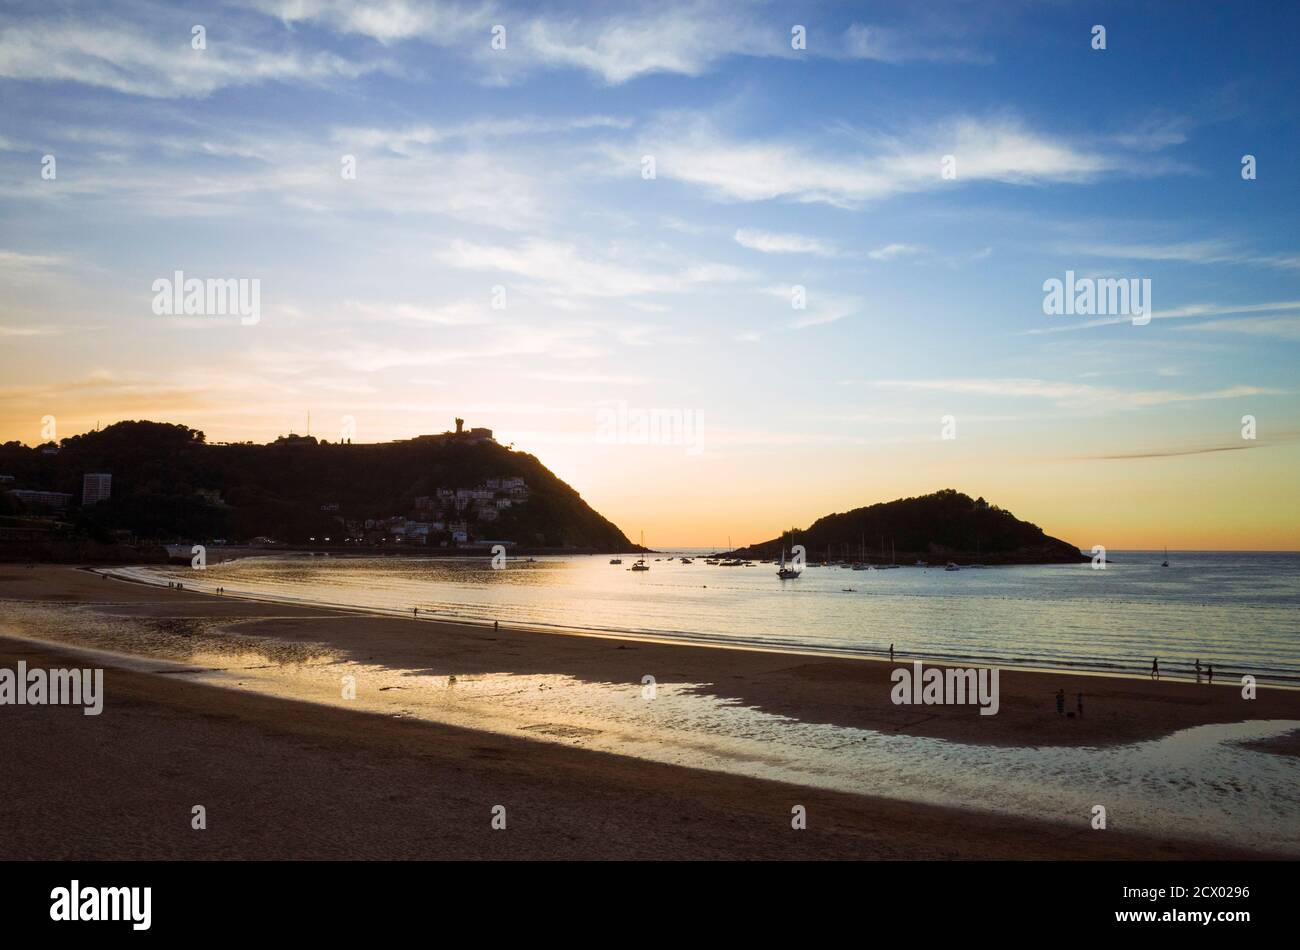 Donostia, Gipuzkoa, país Vasco, España - 12 de julio de 2019 : puesta de sol sobre la playa de la Concha. Montaña Igeldo en el fondo. Foto de stock